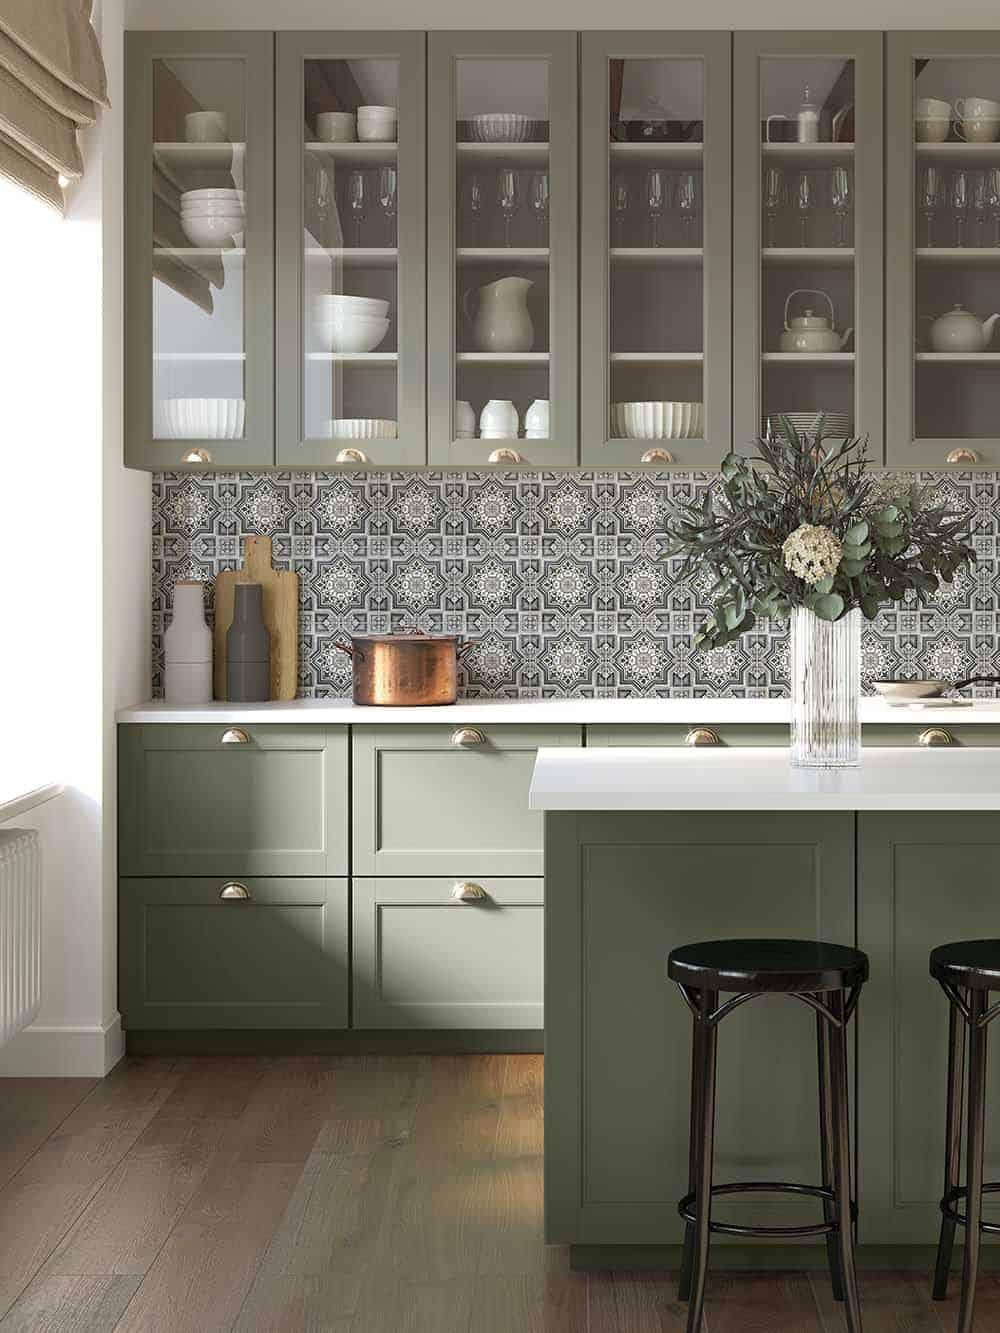 Cabrillo Nightfall Sage Green Cabinetry